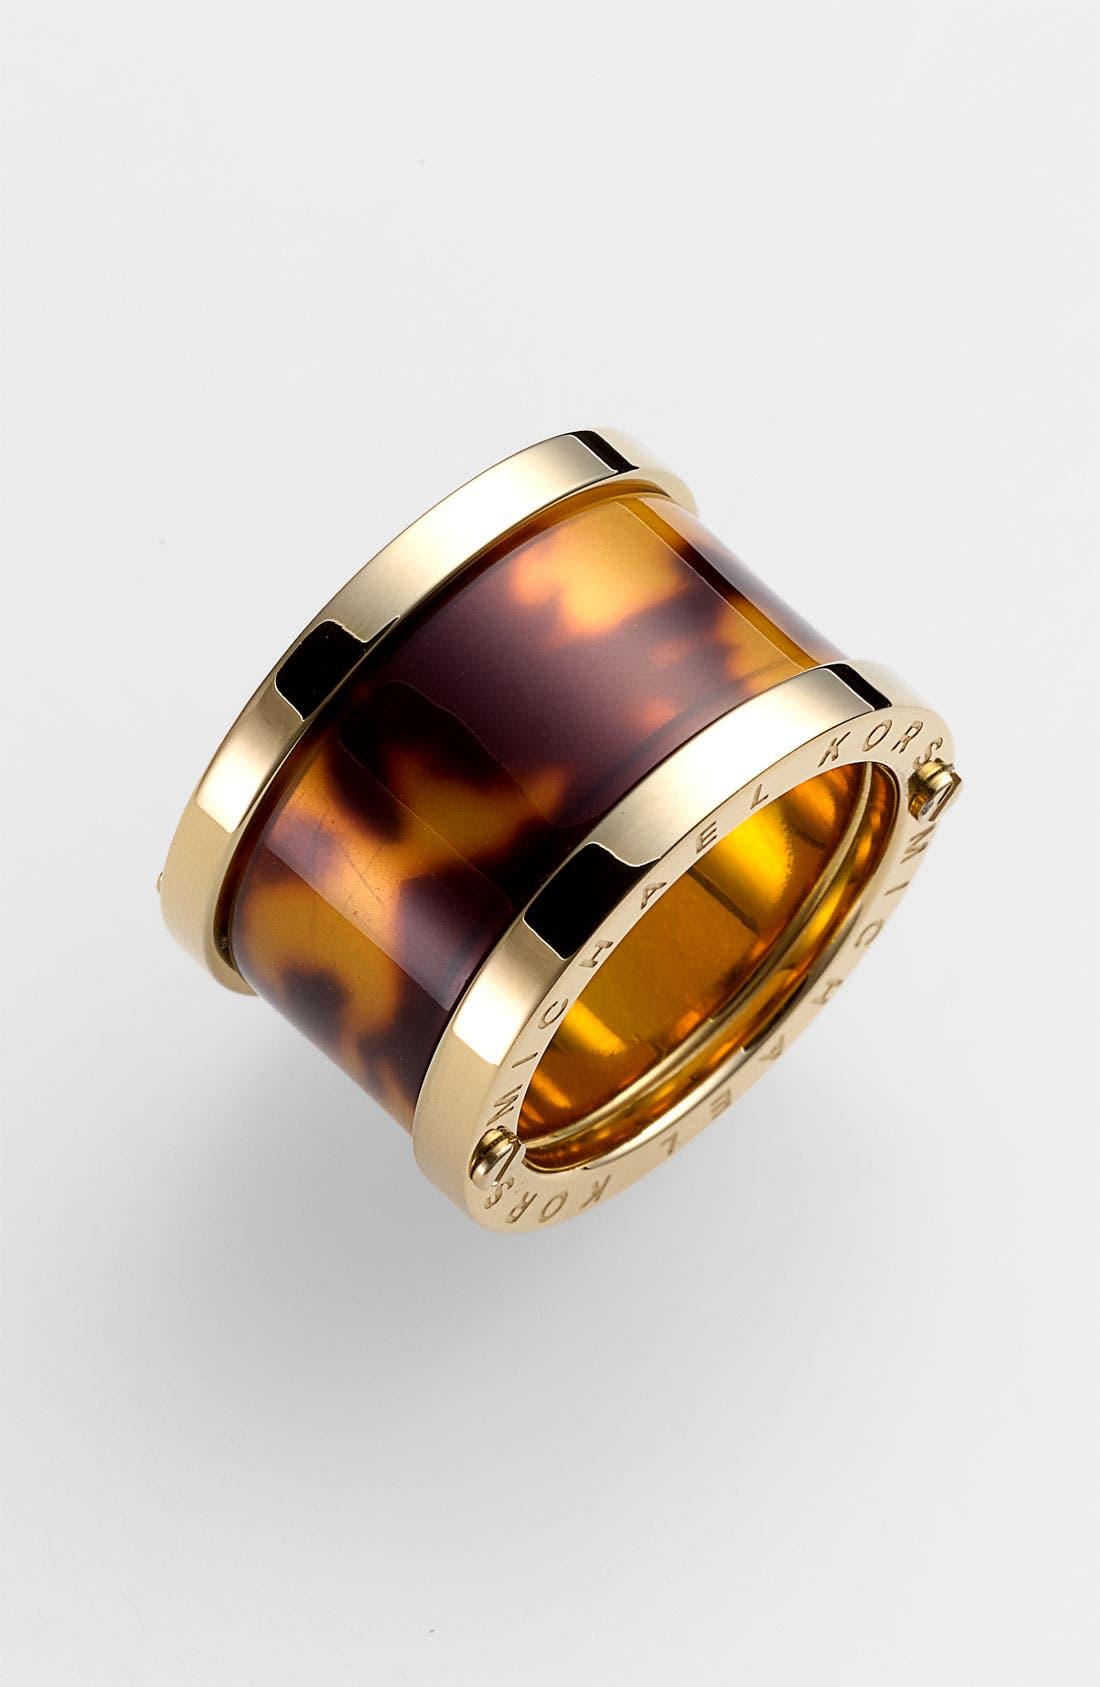 Main Image - Michael Kors 'Sleek Exotics' Barrel Ring